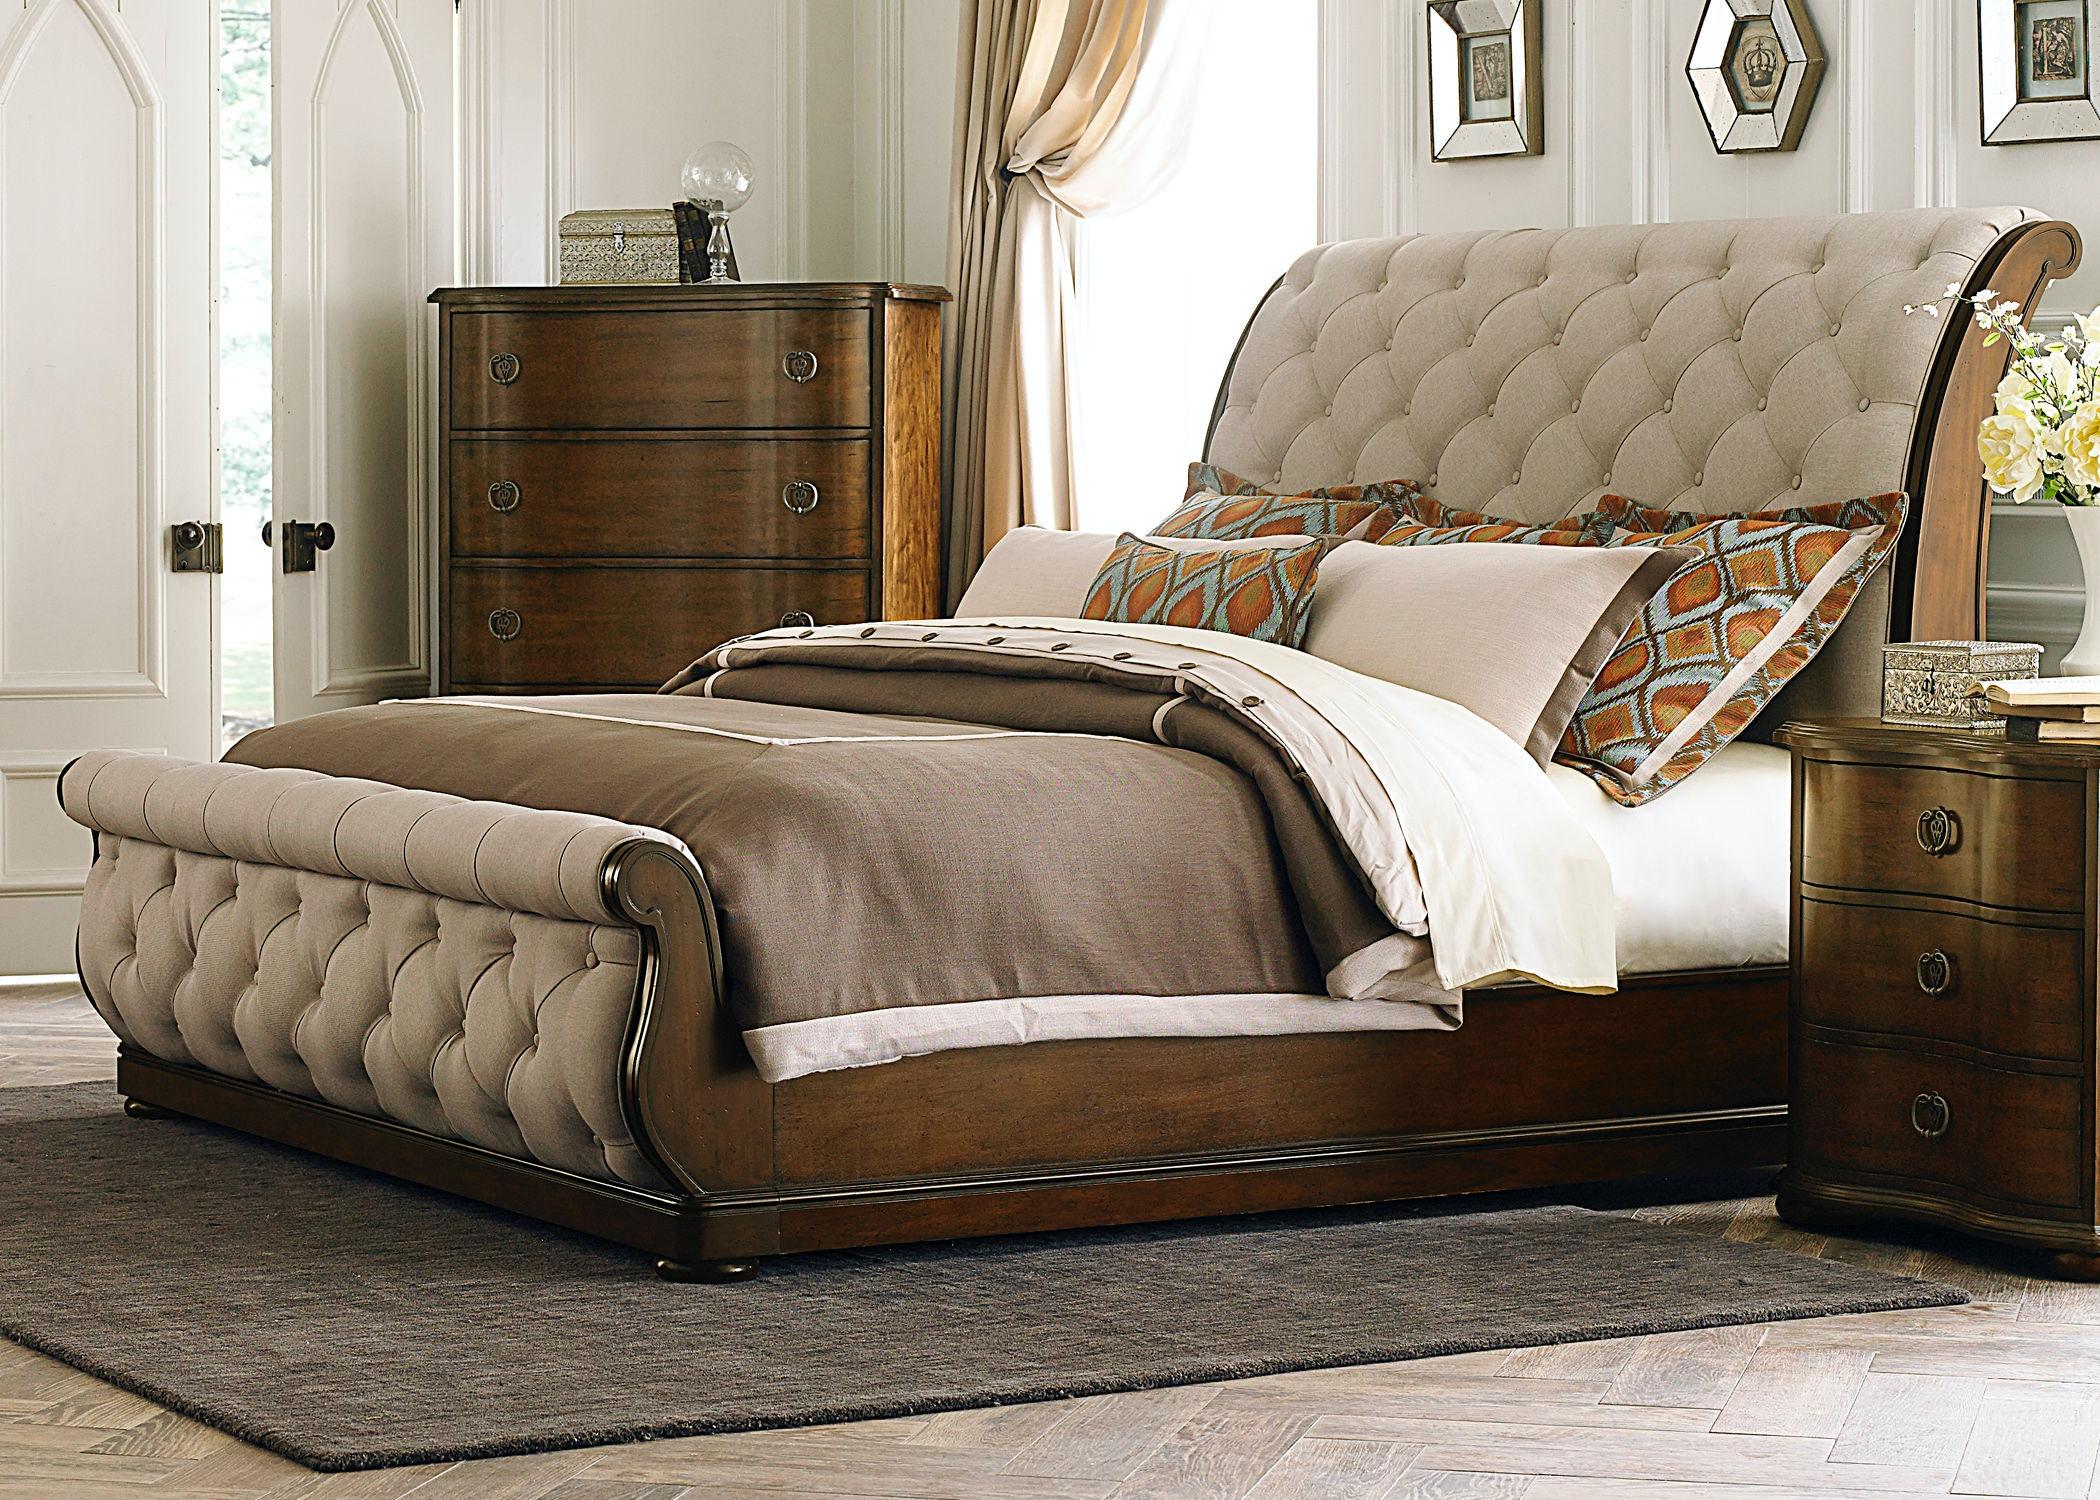 Liberty Furniture Bedroom Queen Uph Sleigh Headboard 545 BR21H At D Noblin  Furniture